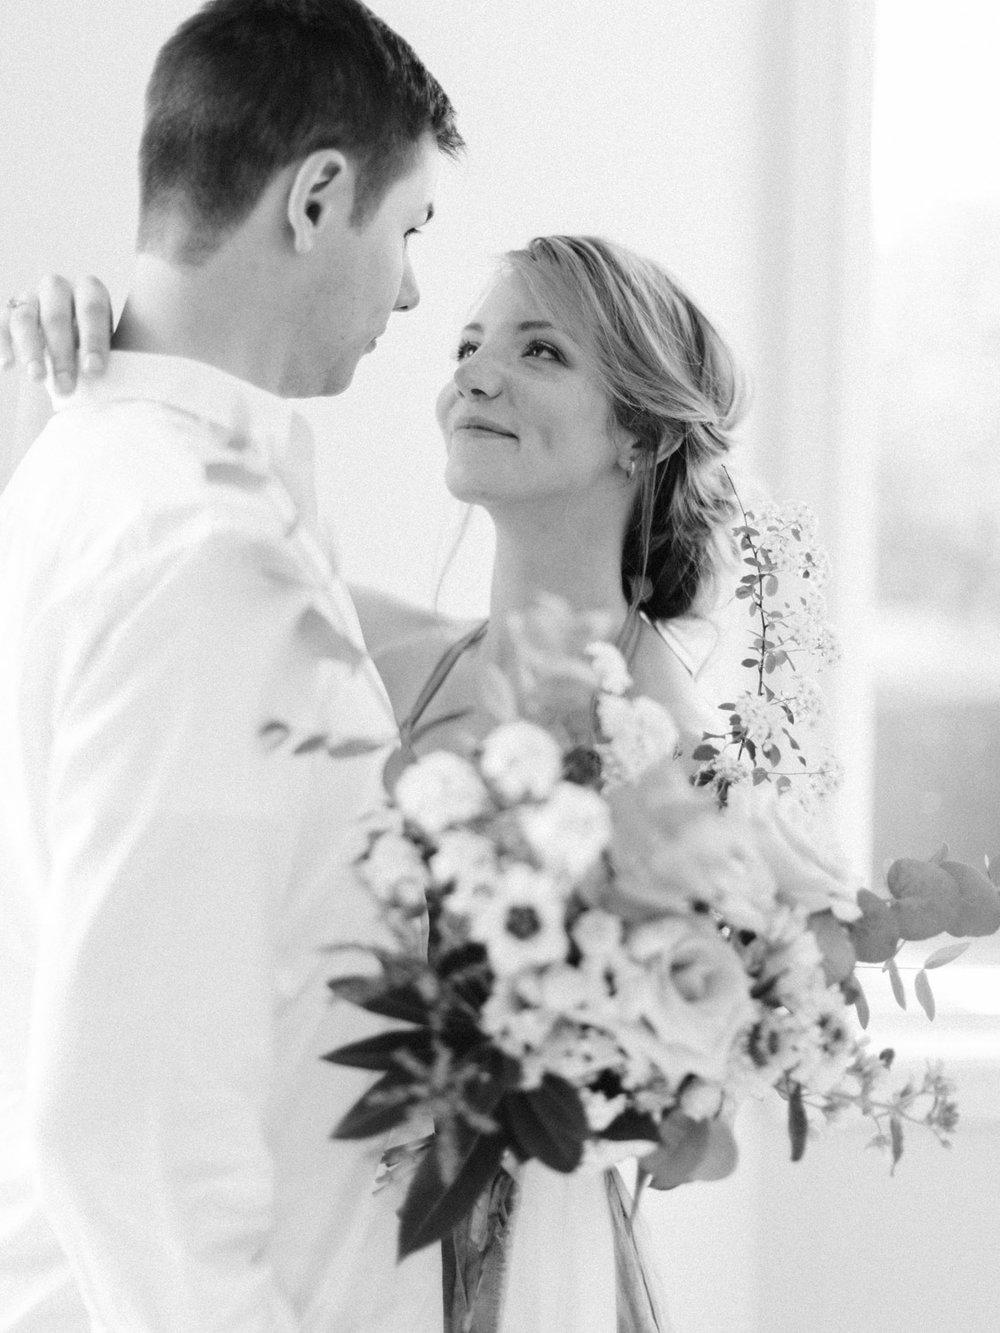 toronto-collingwood-wedding-photographer-at-home-engagement-inspiration 2018-320.jpg